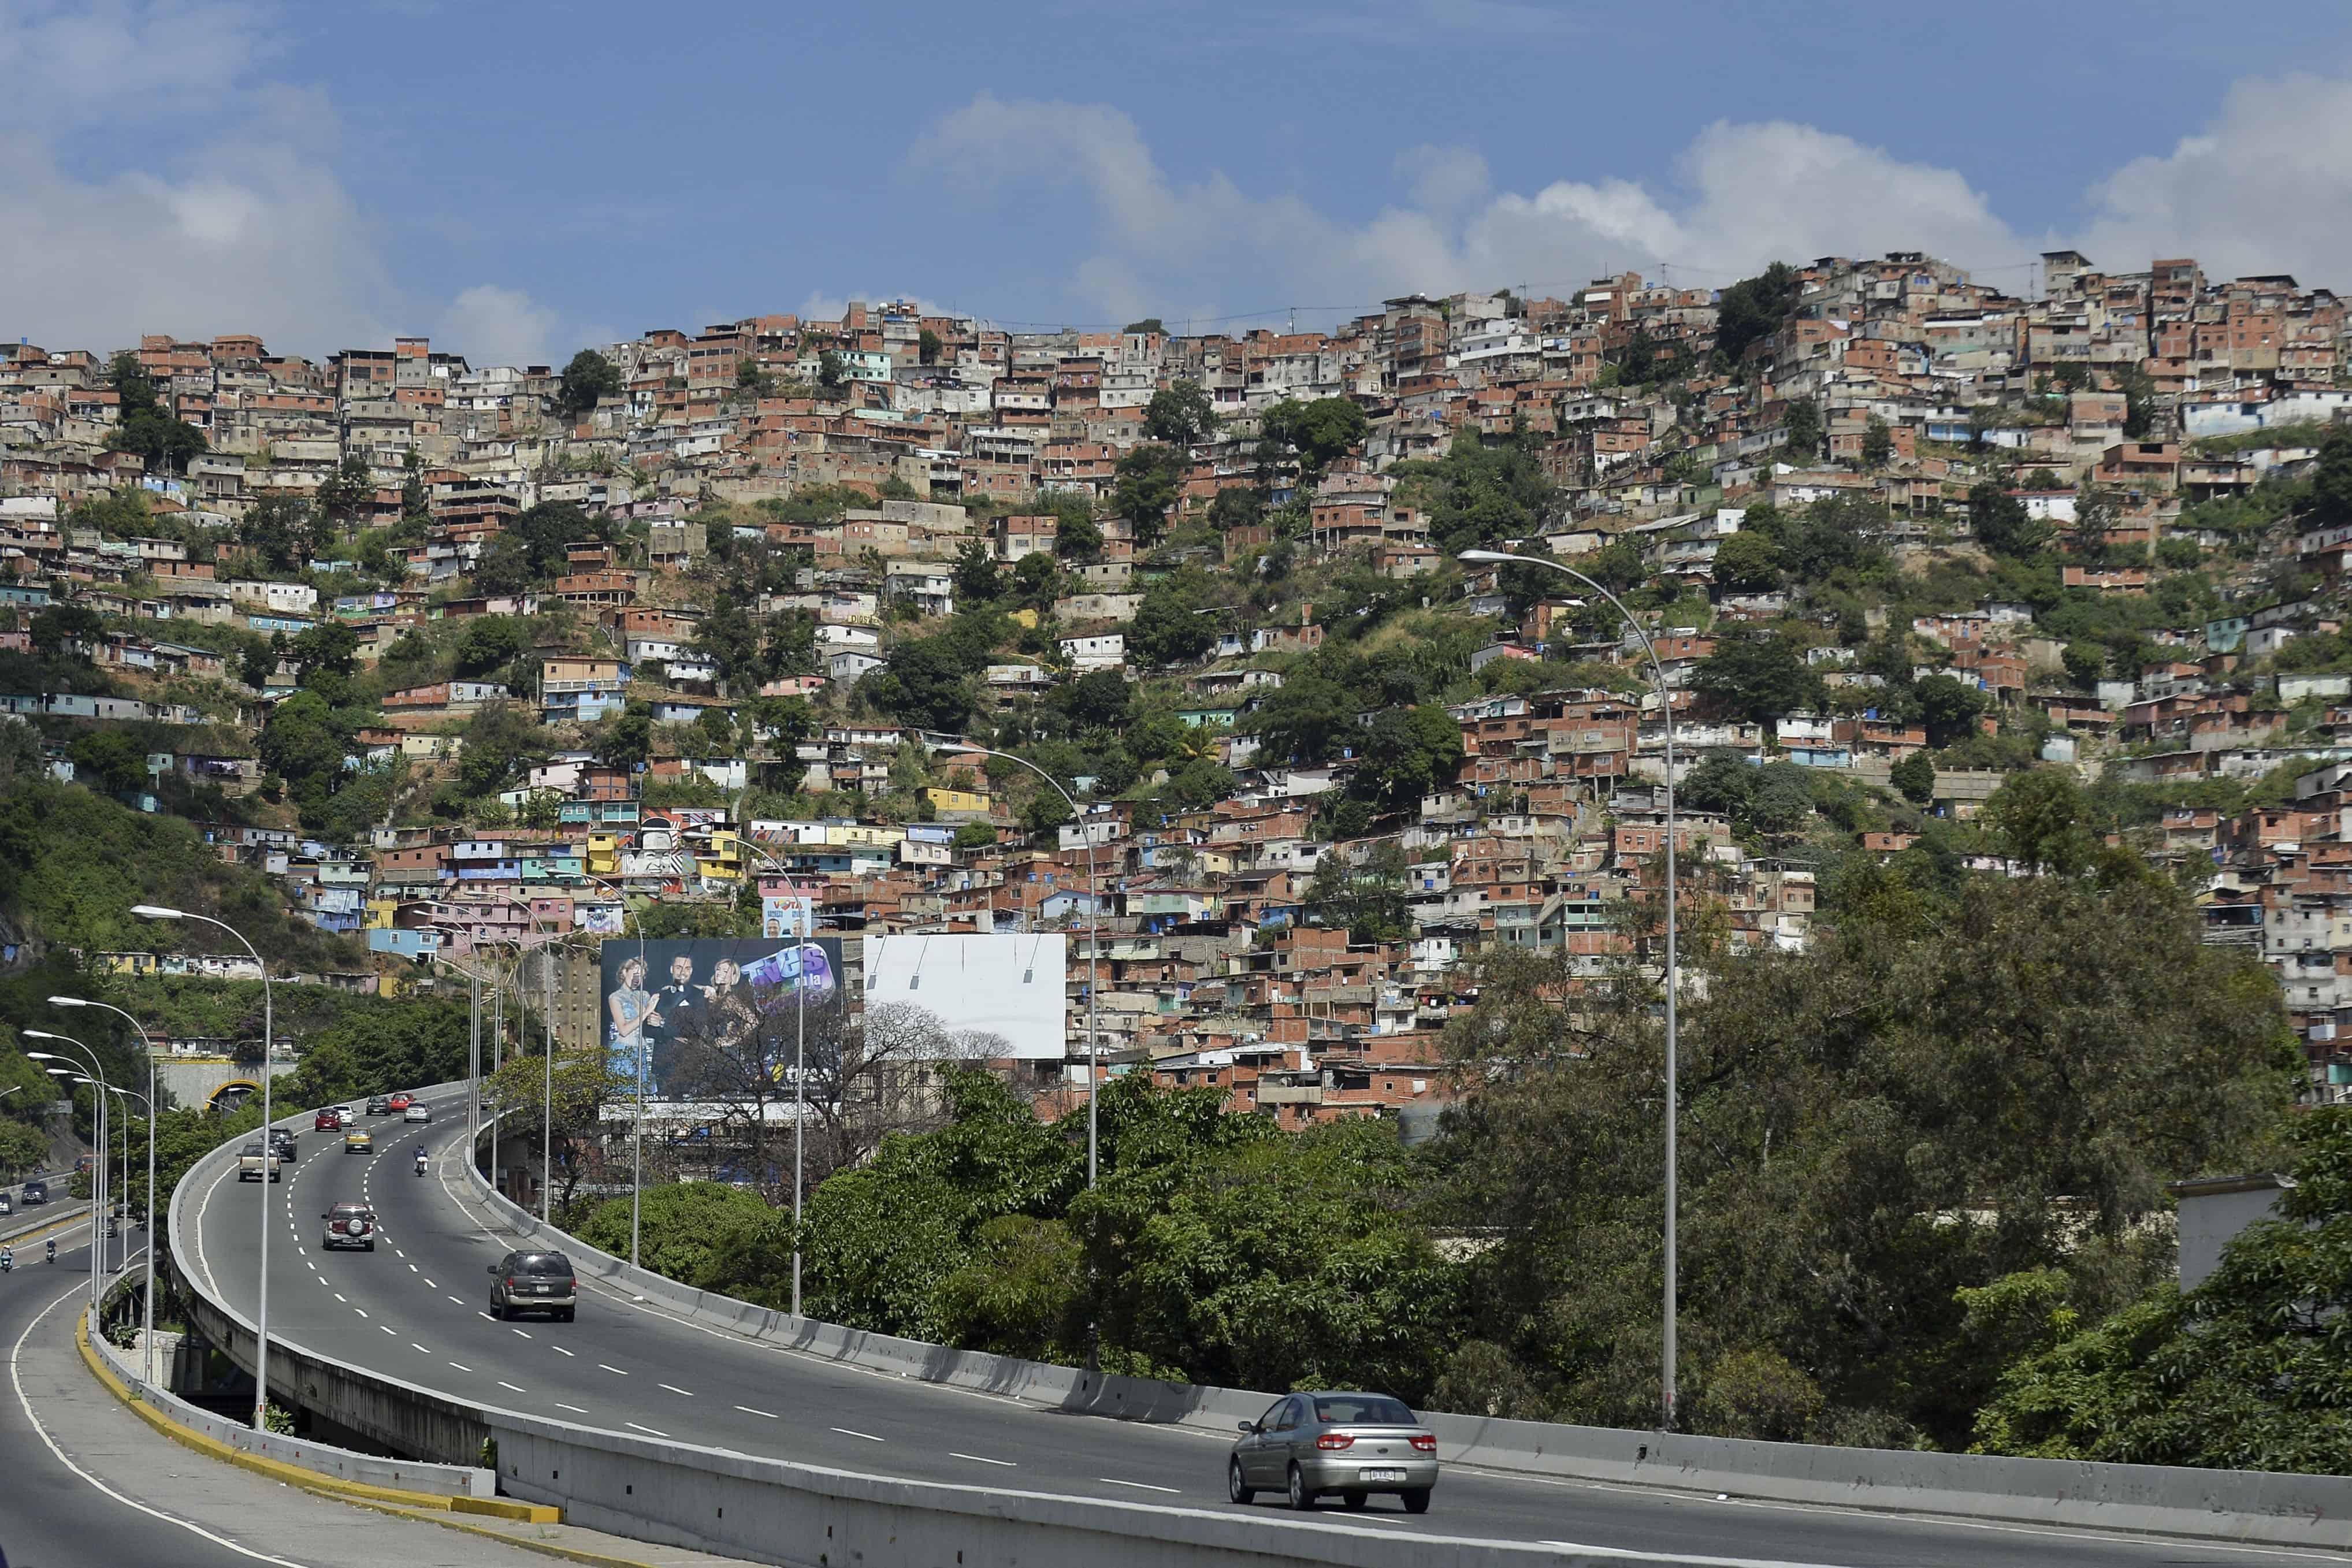 Venezuela facts: Caracas